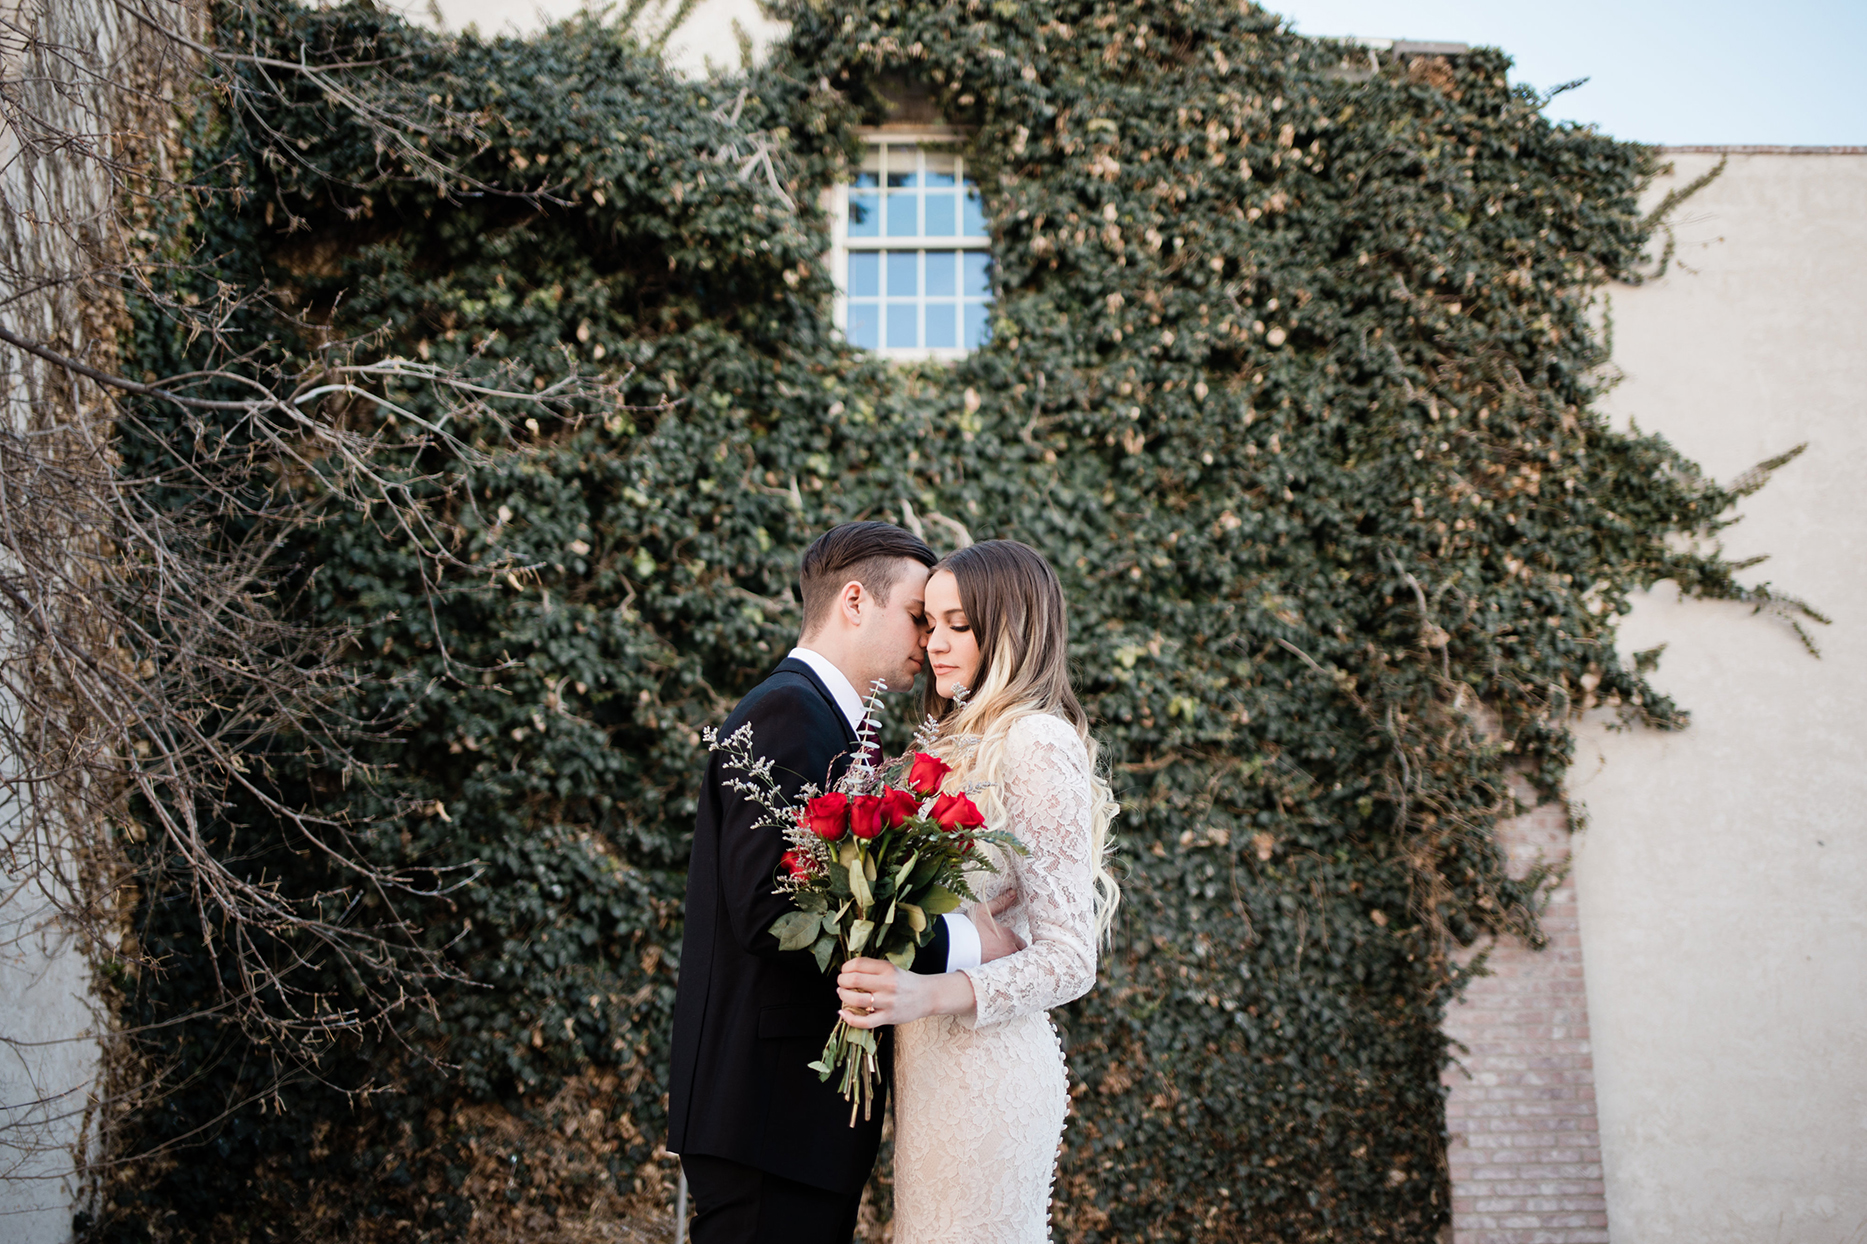 Tyler Bethany Sneak Peek Bridals Jan 20 2018-print-0003.jpg